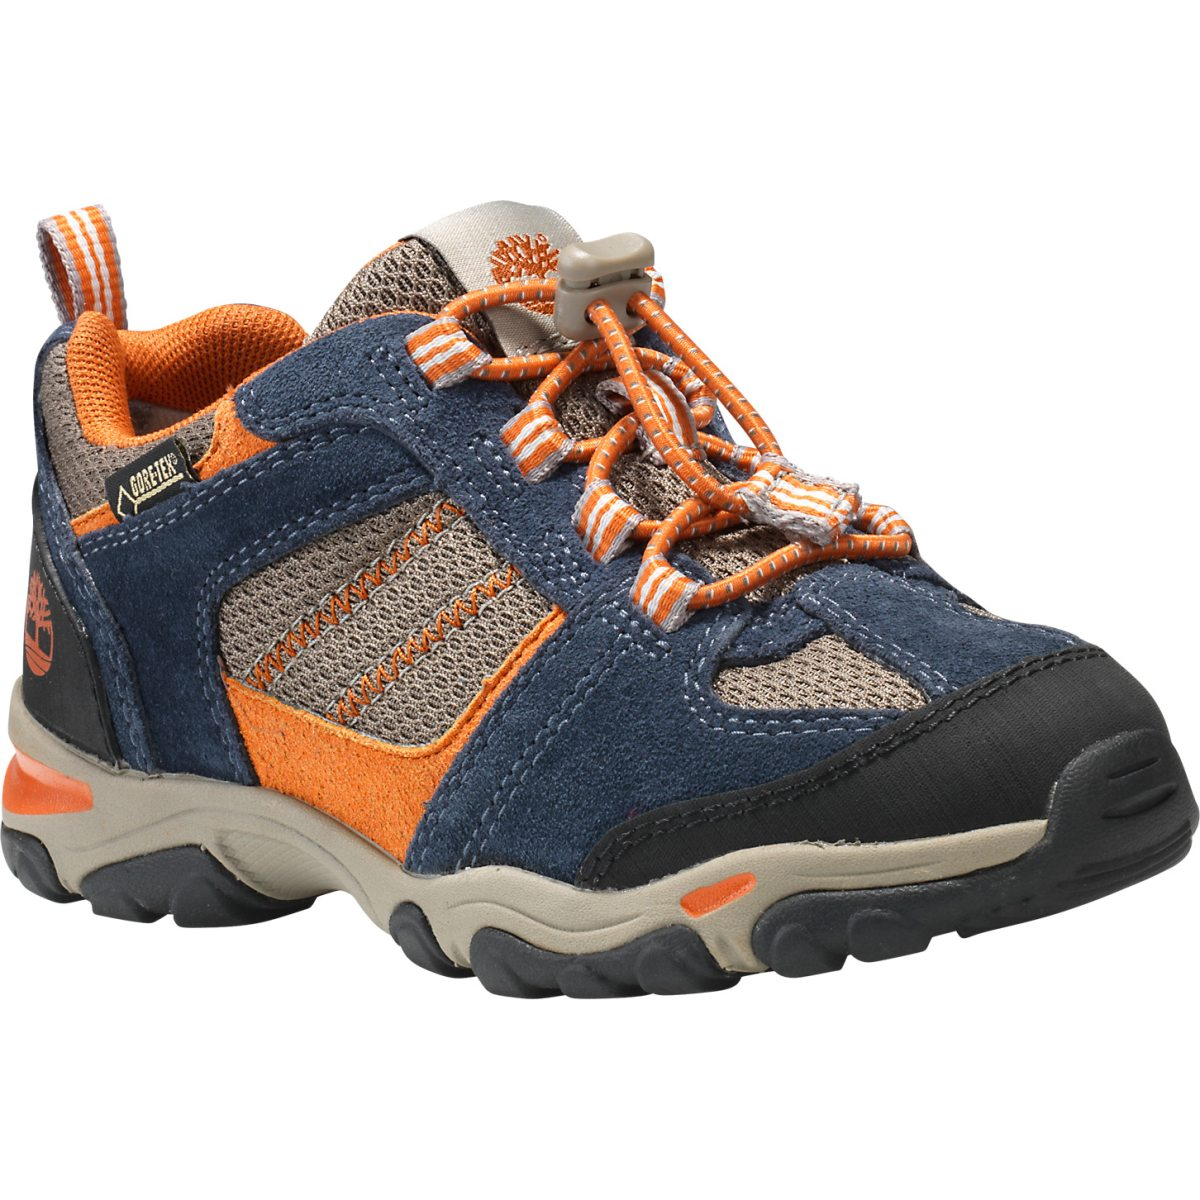 wholesale dealer 678be 9058b blå timberland trailforce f l gtx bungee fritidssko barn fritidsskor och  sneakers